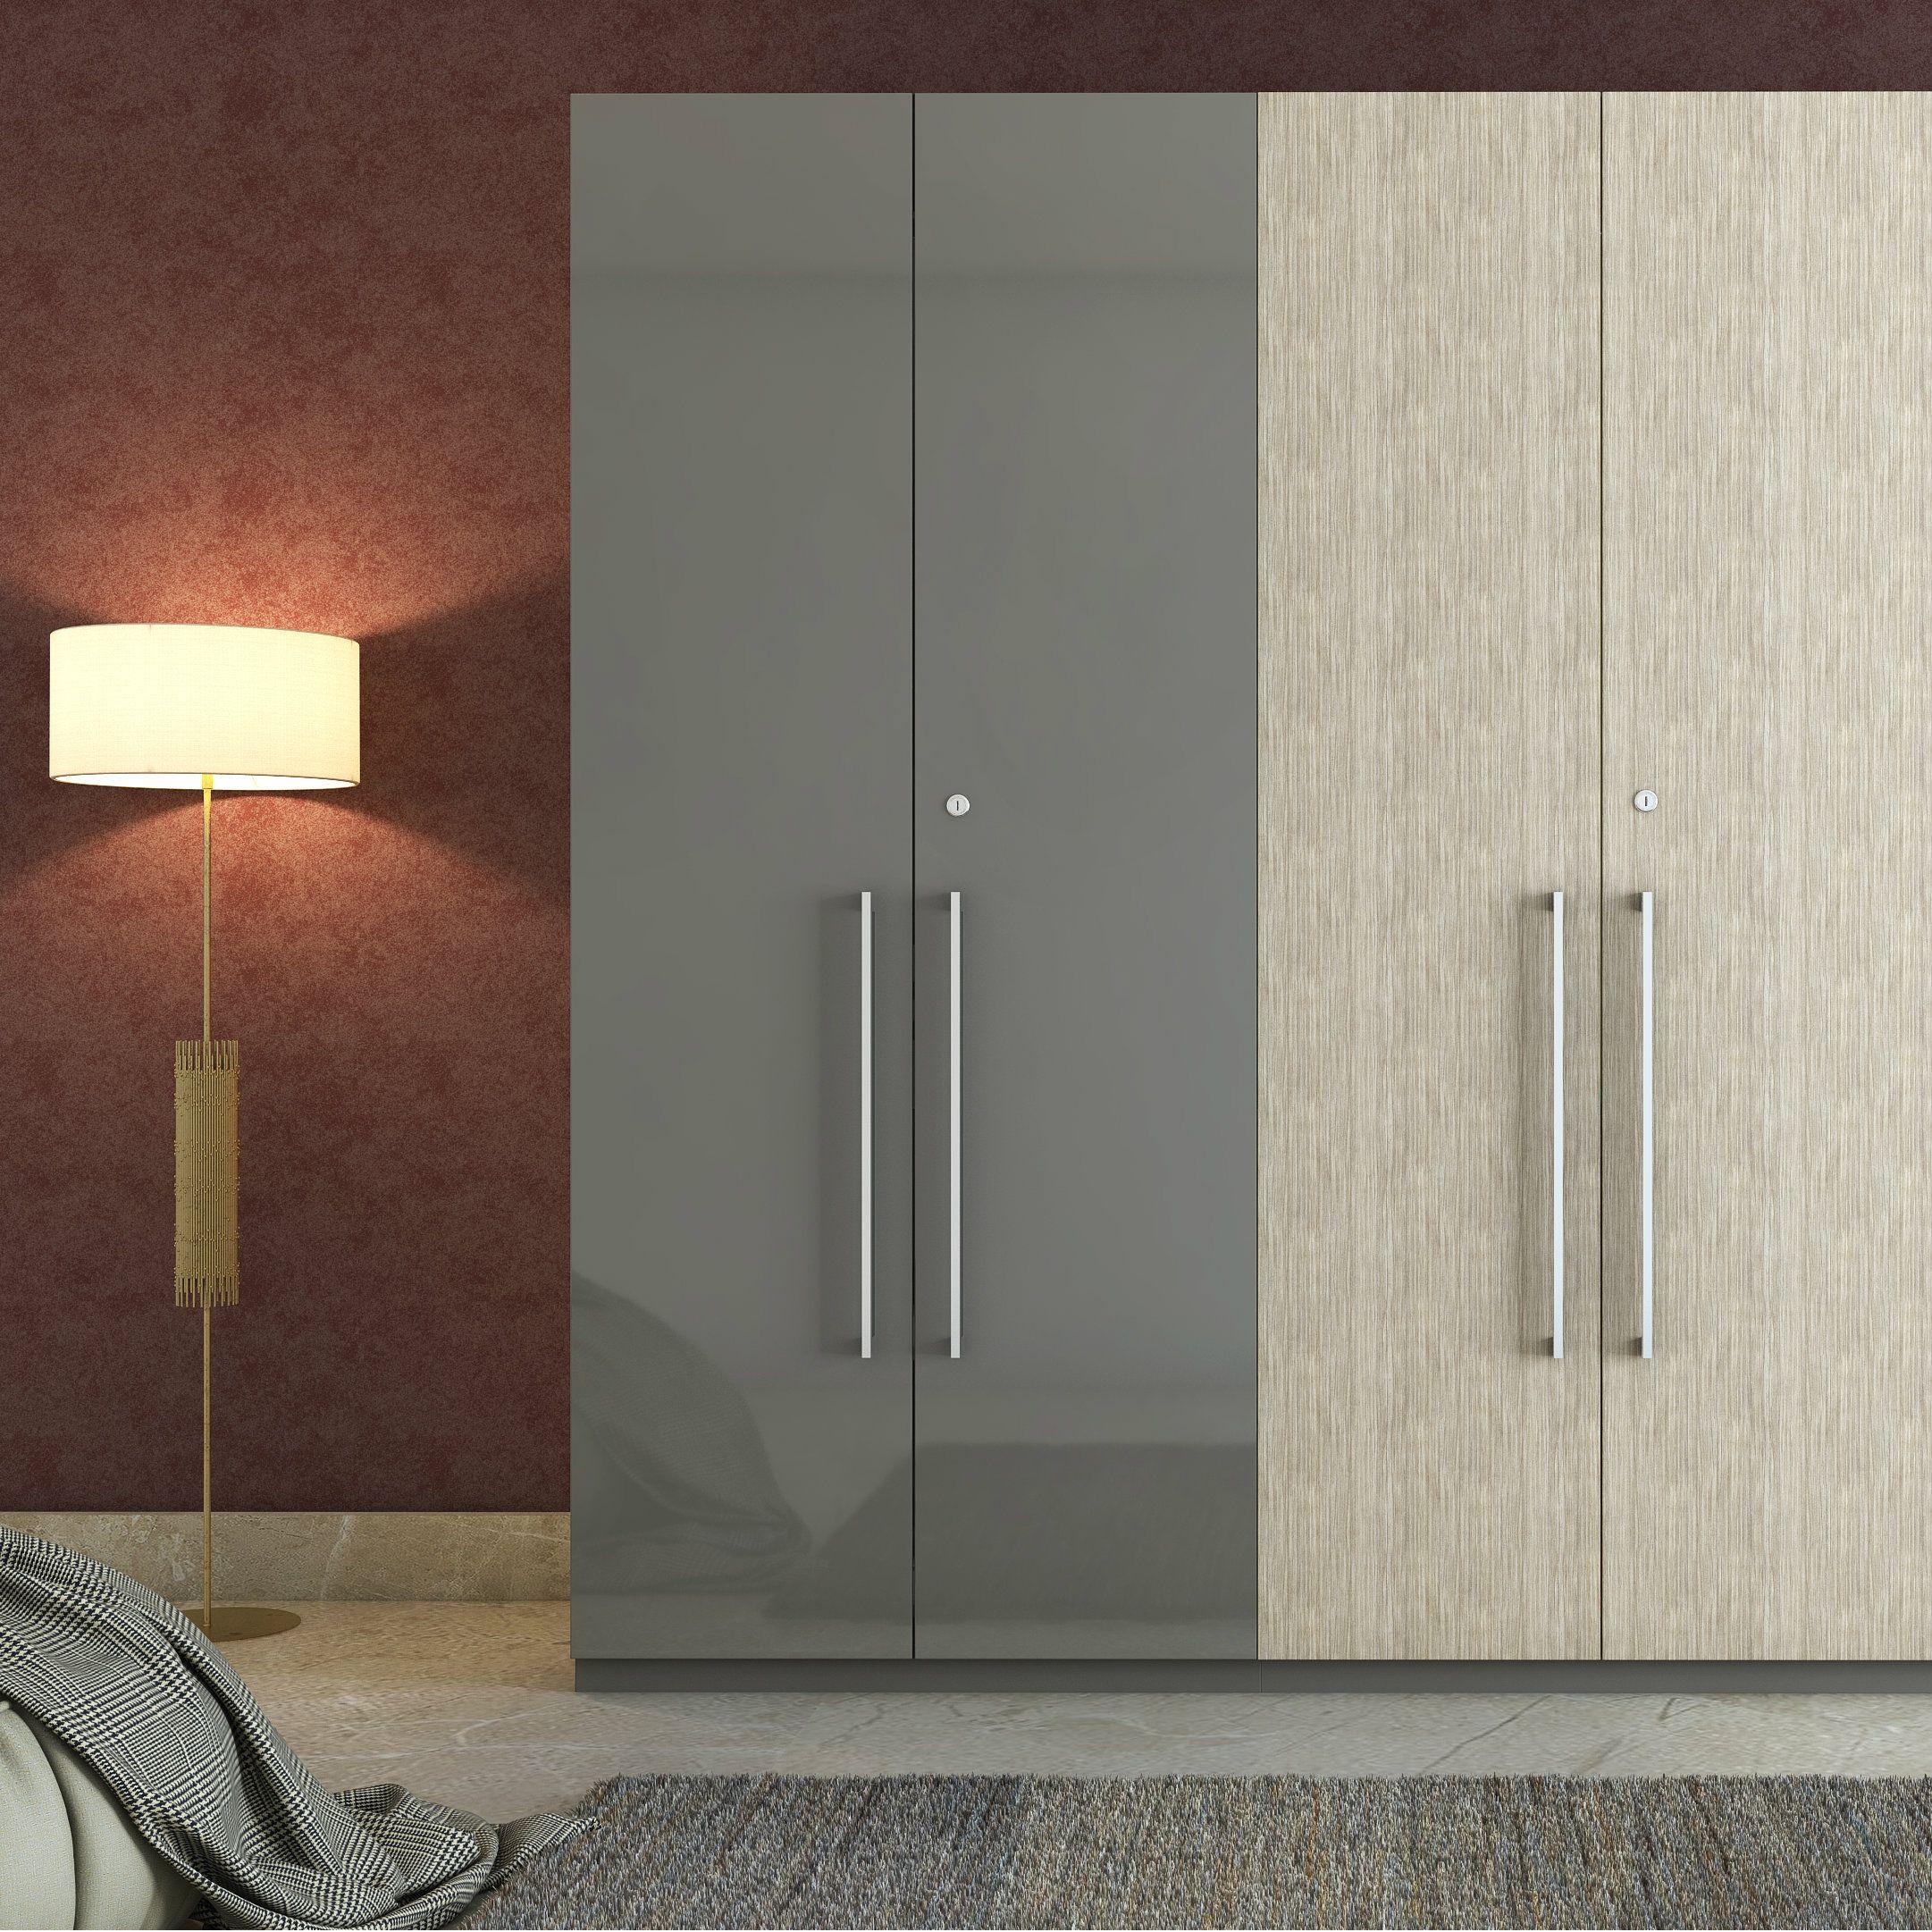 A Dual Tone Swing Door Wardrobe For Segregating Your Essentials Wardrobe Door Designs Wardrobe Laminate Design Cupboard Design